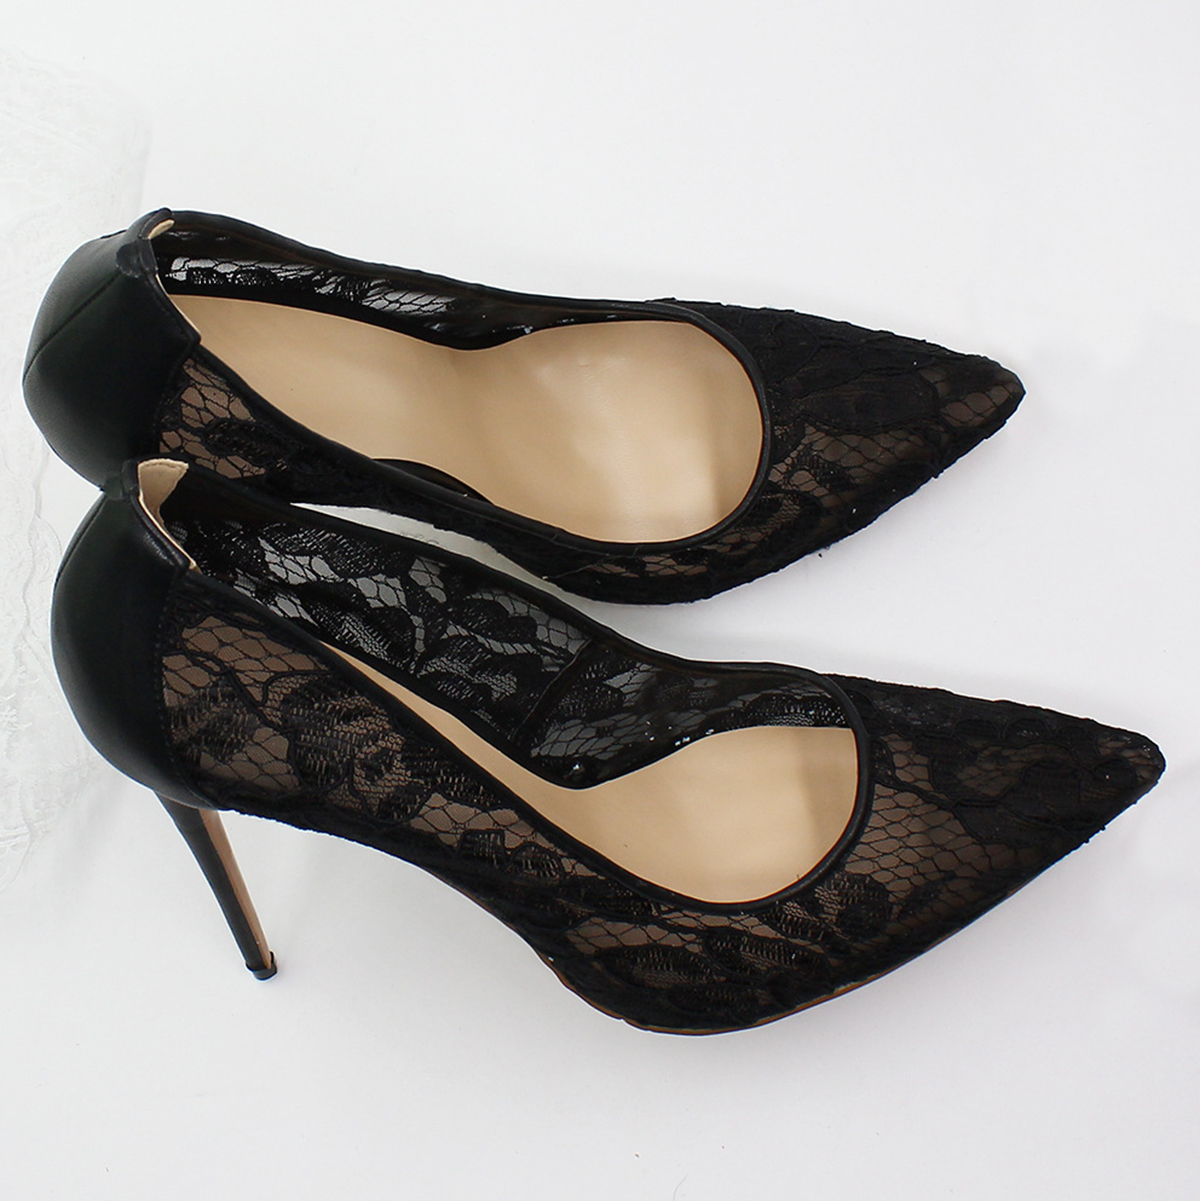 4366018d Pie Dedo Verano Tacones Negro Alto Puntiagudo Boda De Zapatos Aire Sexy  Aguja Aiyoway Mujer Fiesta ...